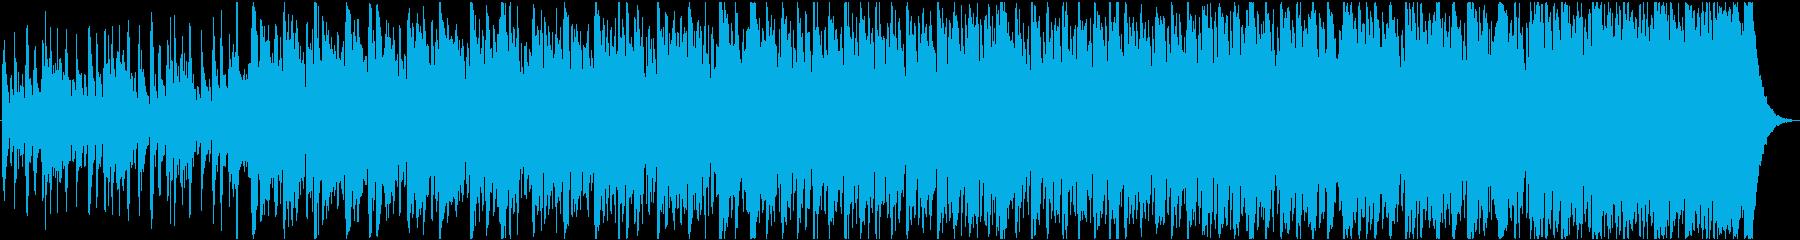 Cartoon music's reproduced waveform